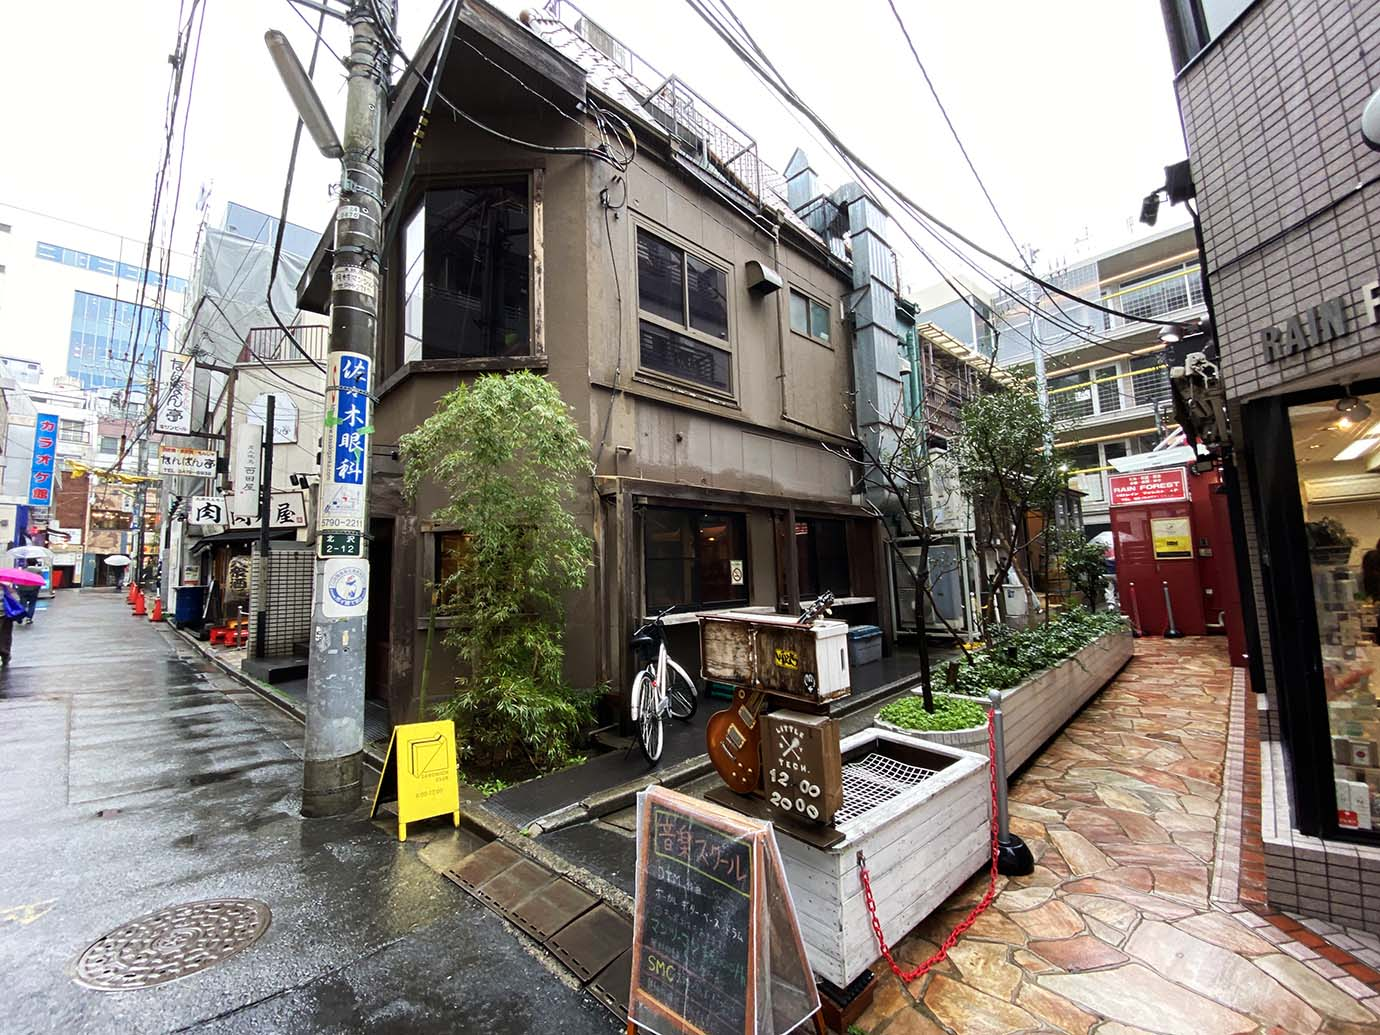 shimokitazawa-atsuen-japan-mee14